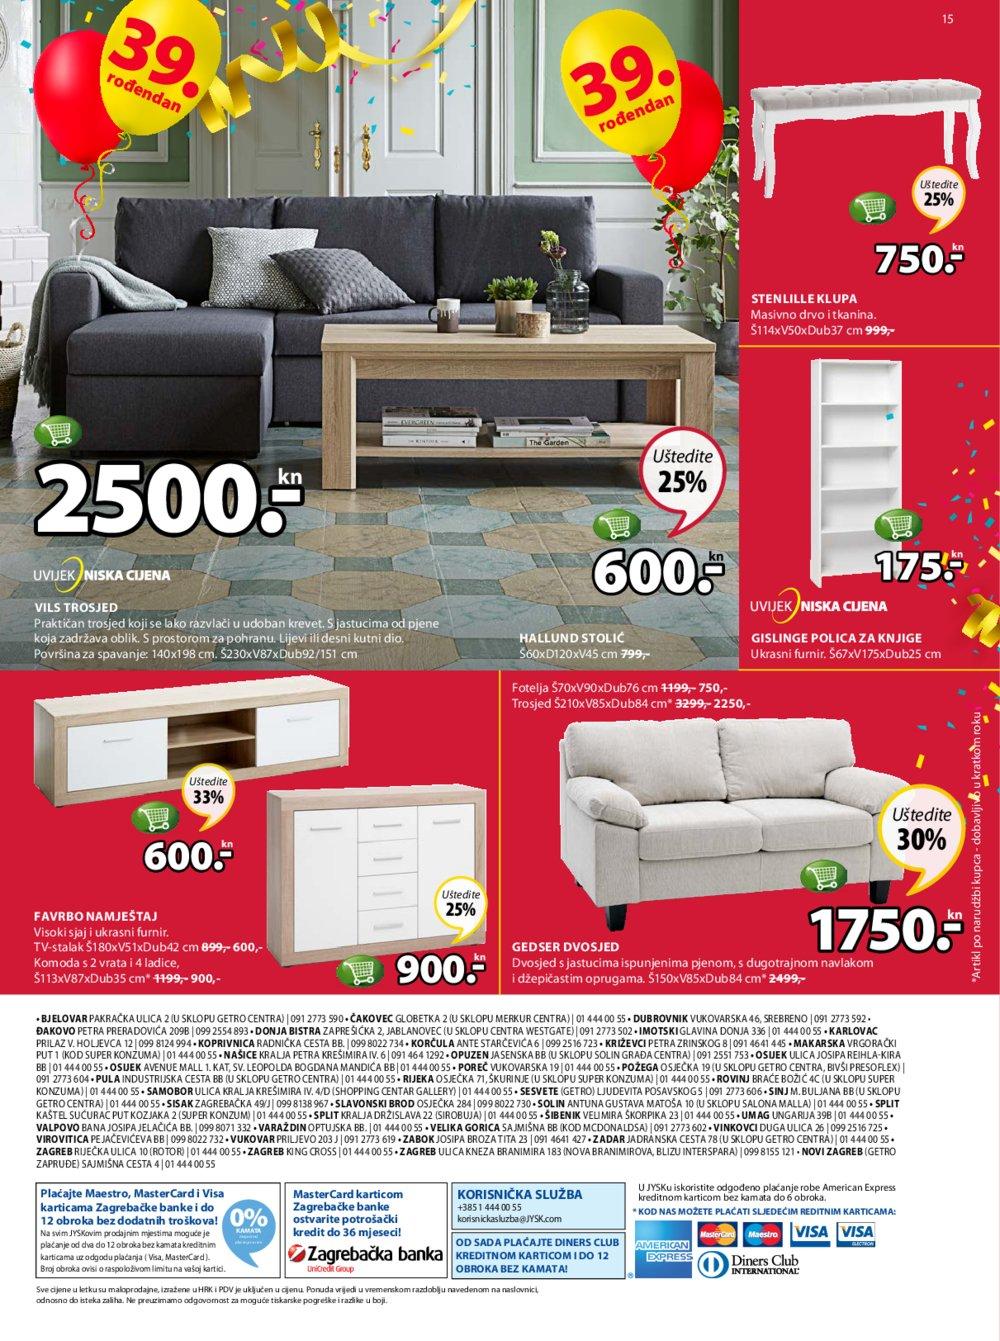 Jysk katalog Akcija 05.04.-18.04.2018.